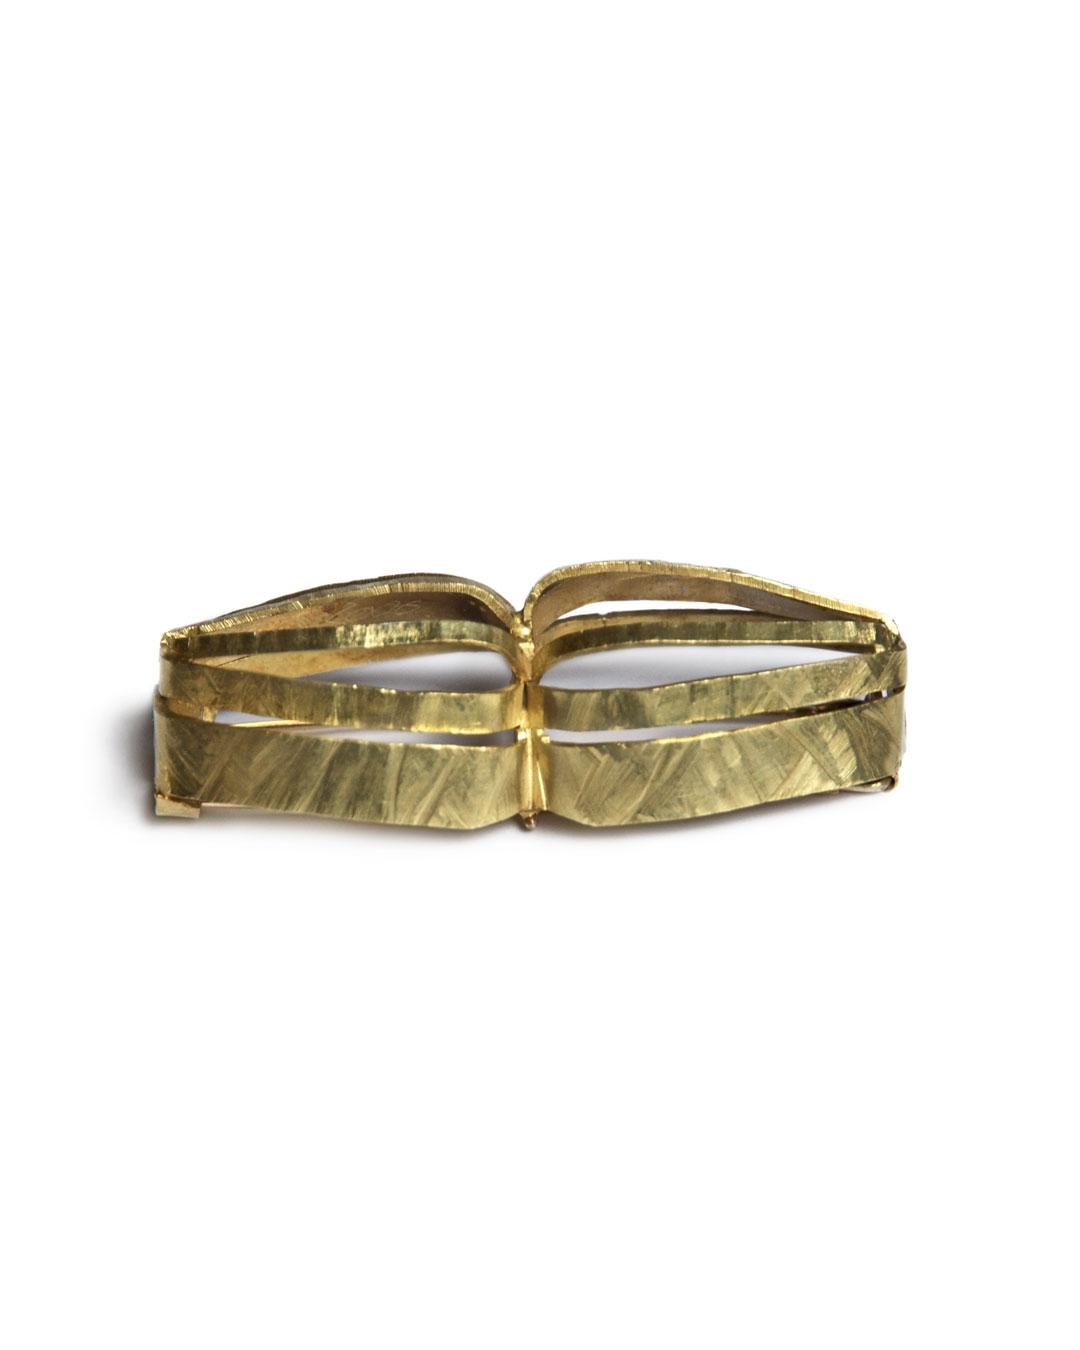 Rudolf Kocéa, Boot (Boat), 2006, brooch; 14ct gold, 60 x 25 x 18 mm, €3840